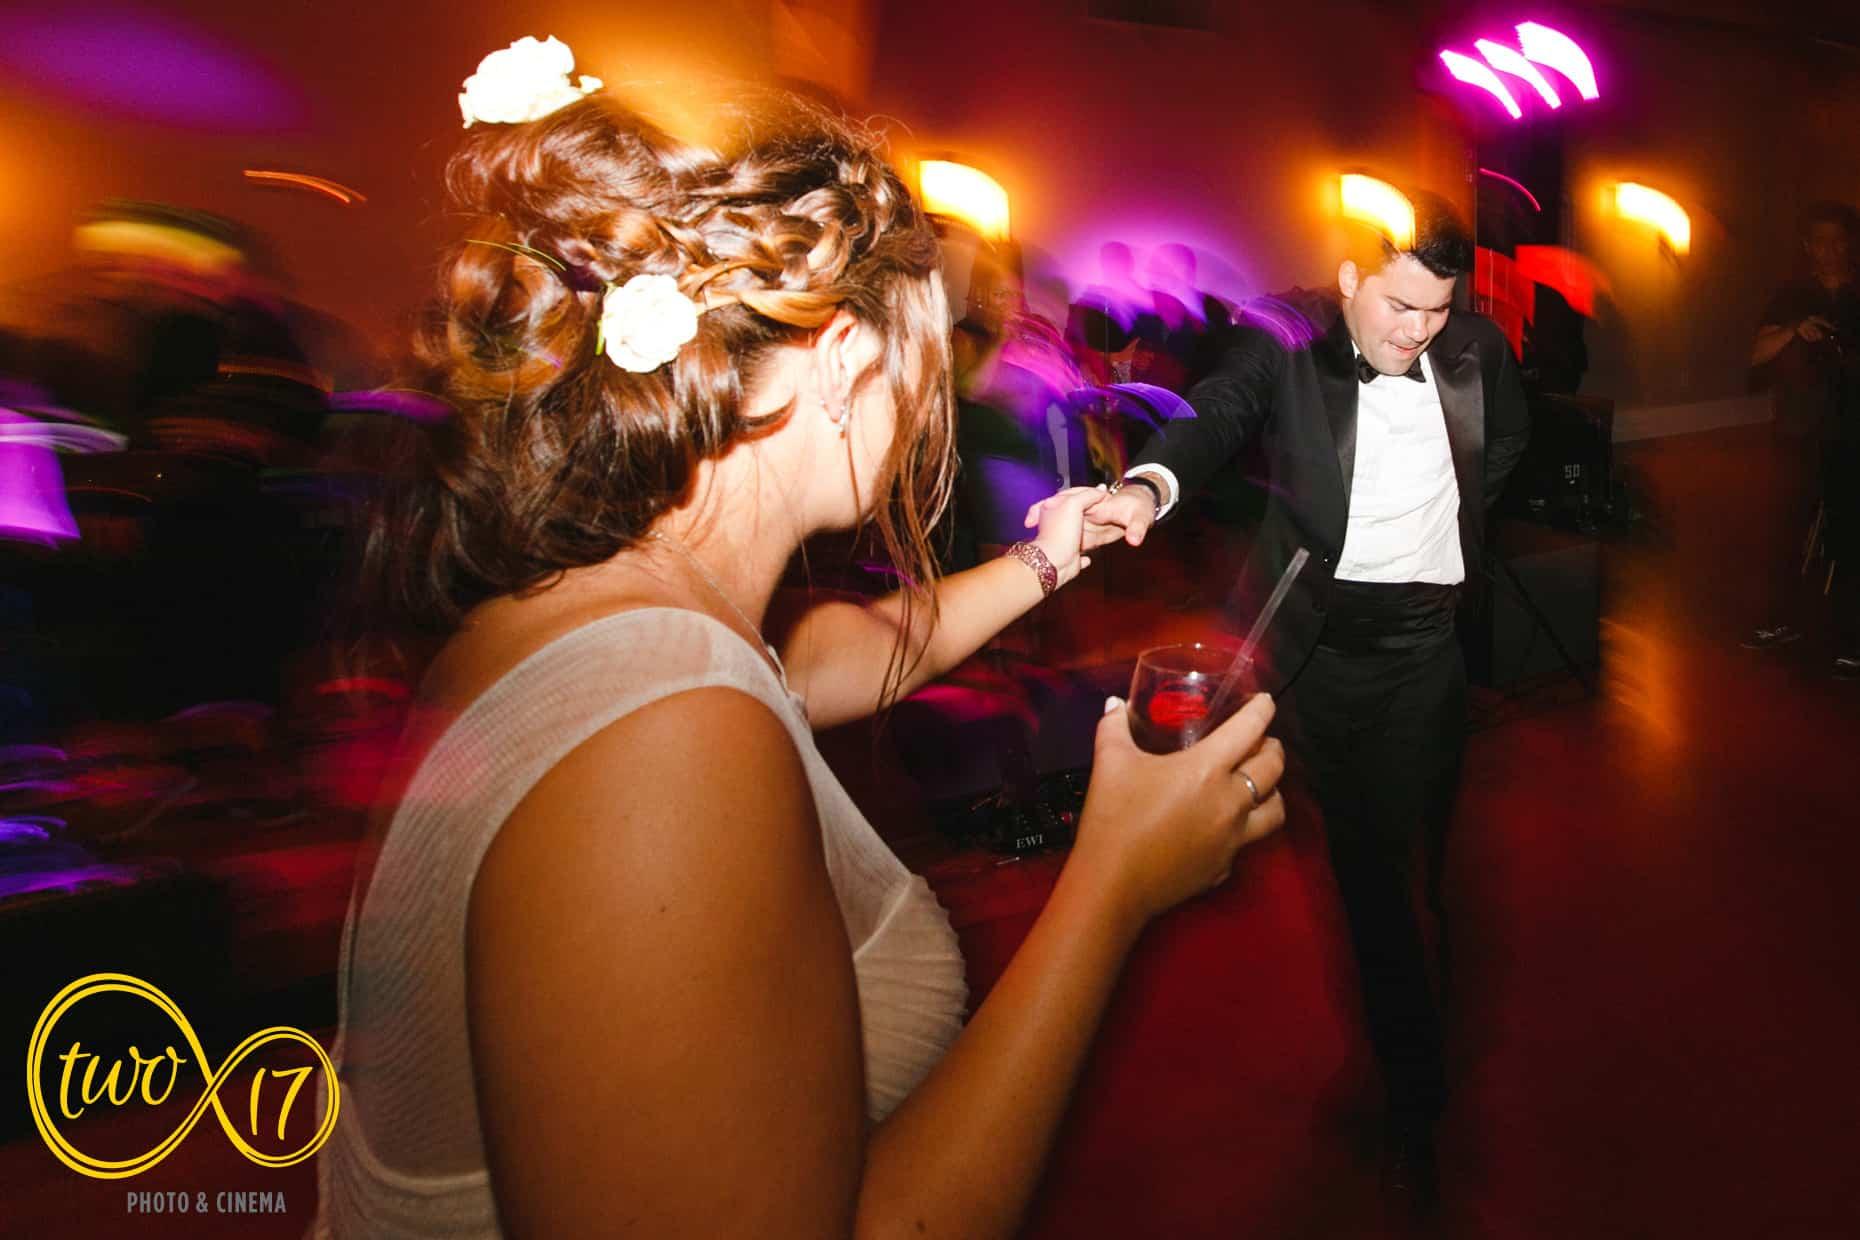 Artistic Cape May wedding photographer